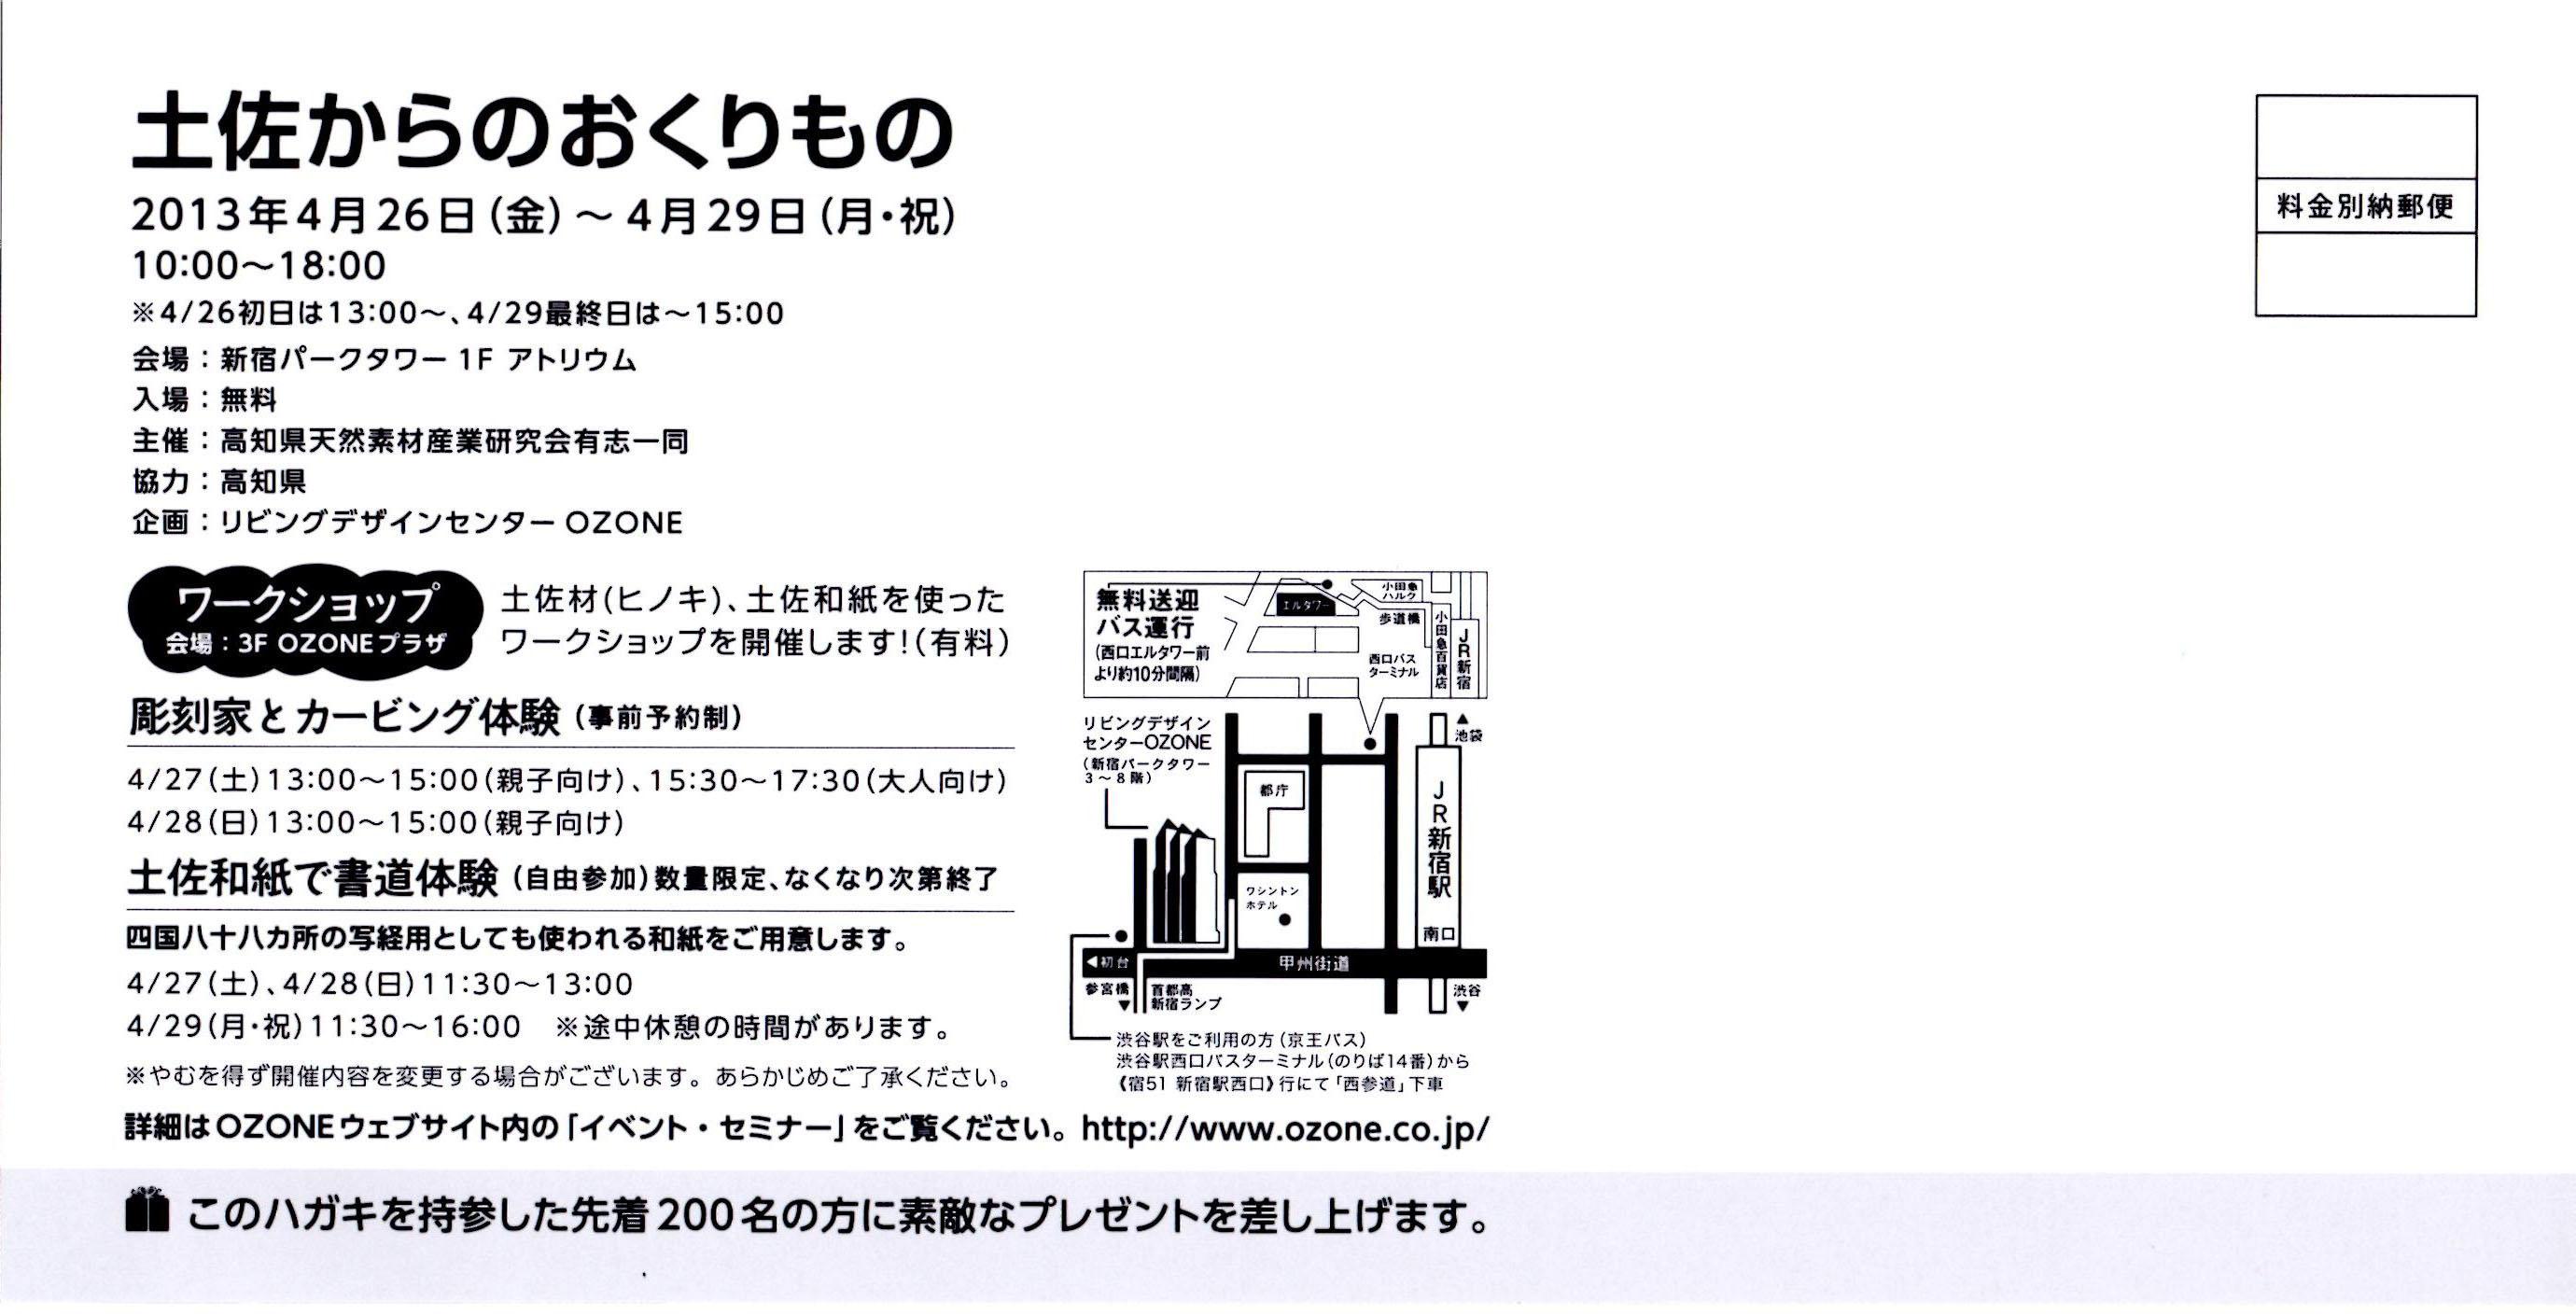 OZONE20130429.jpg